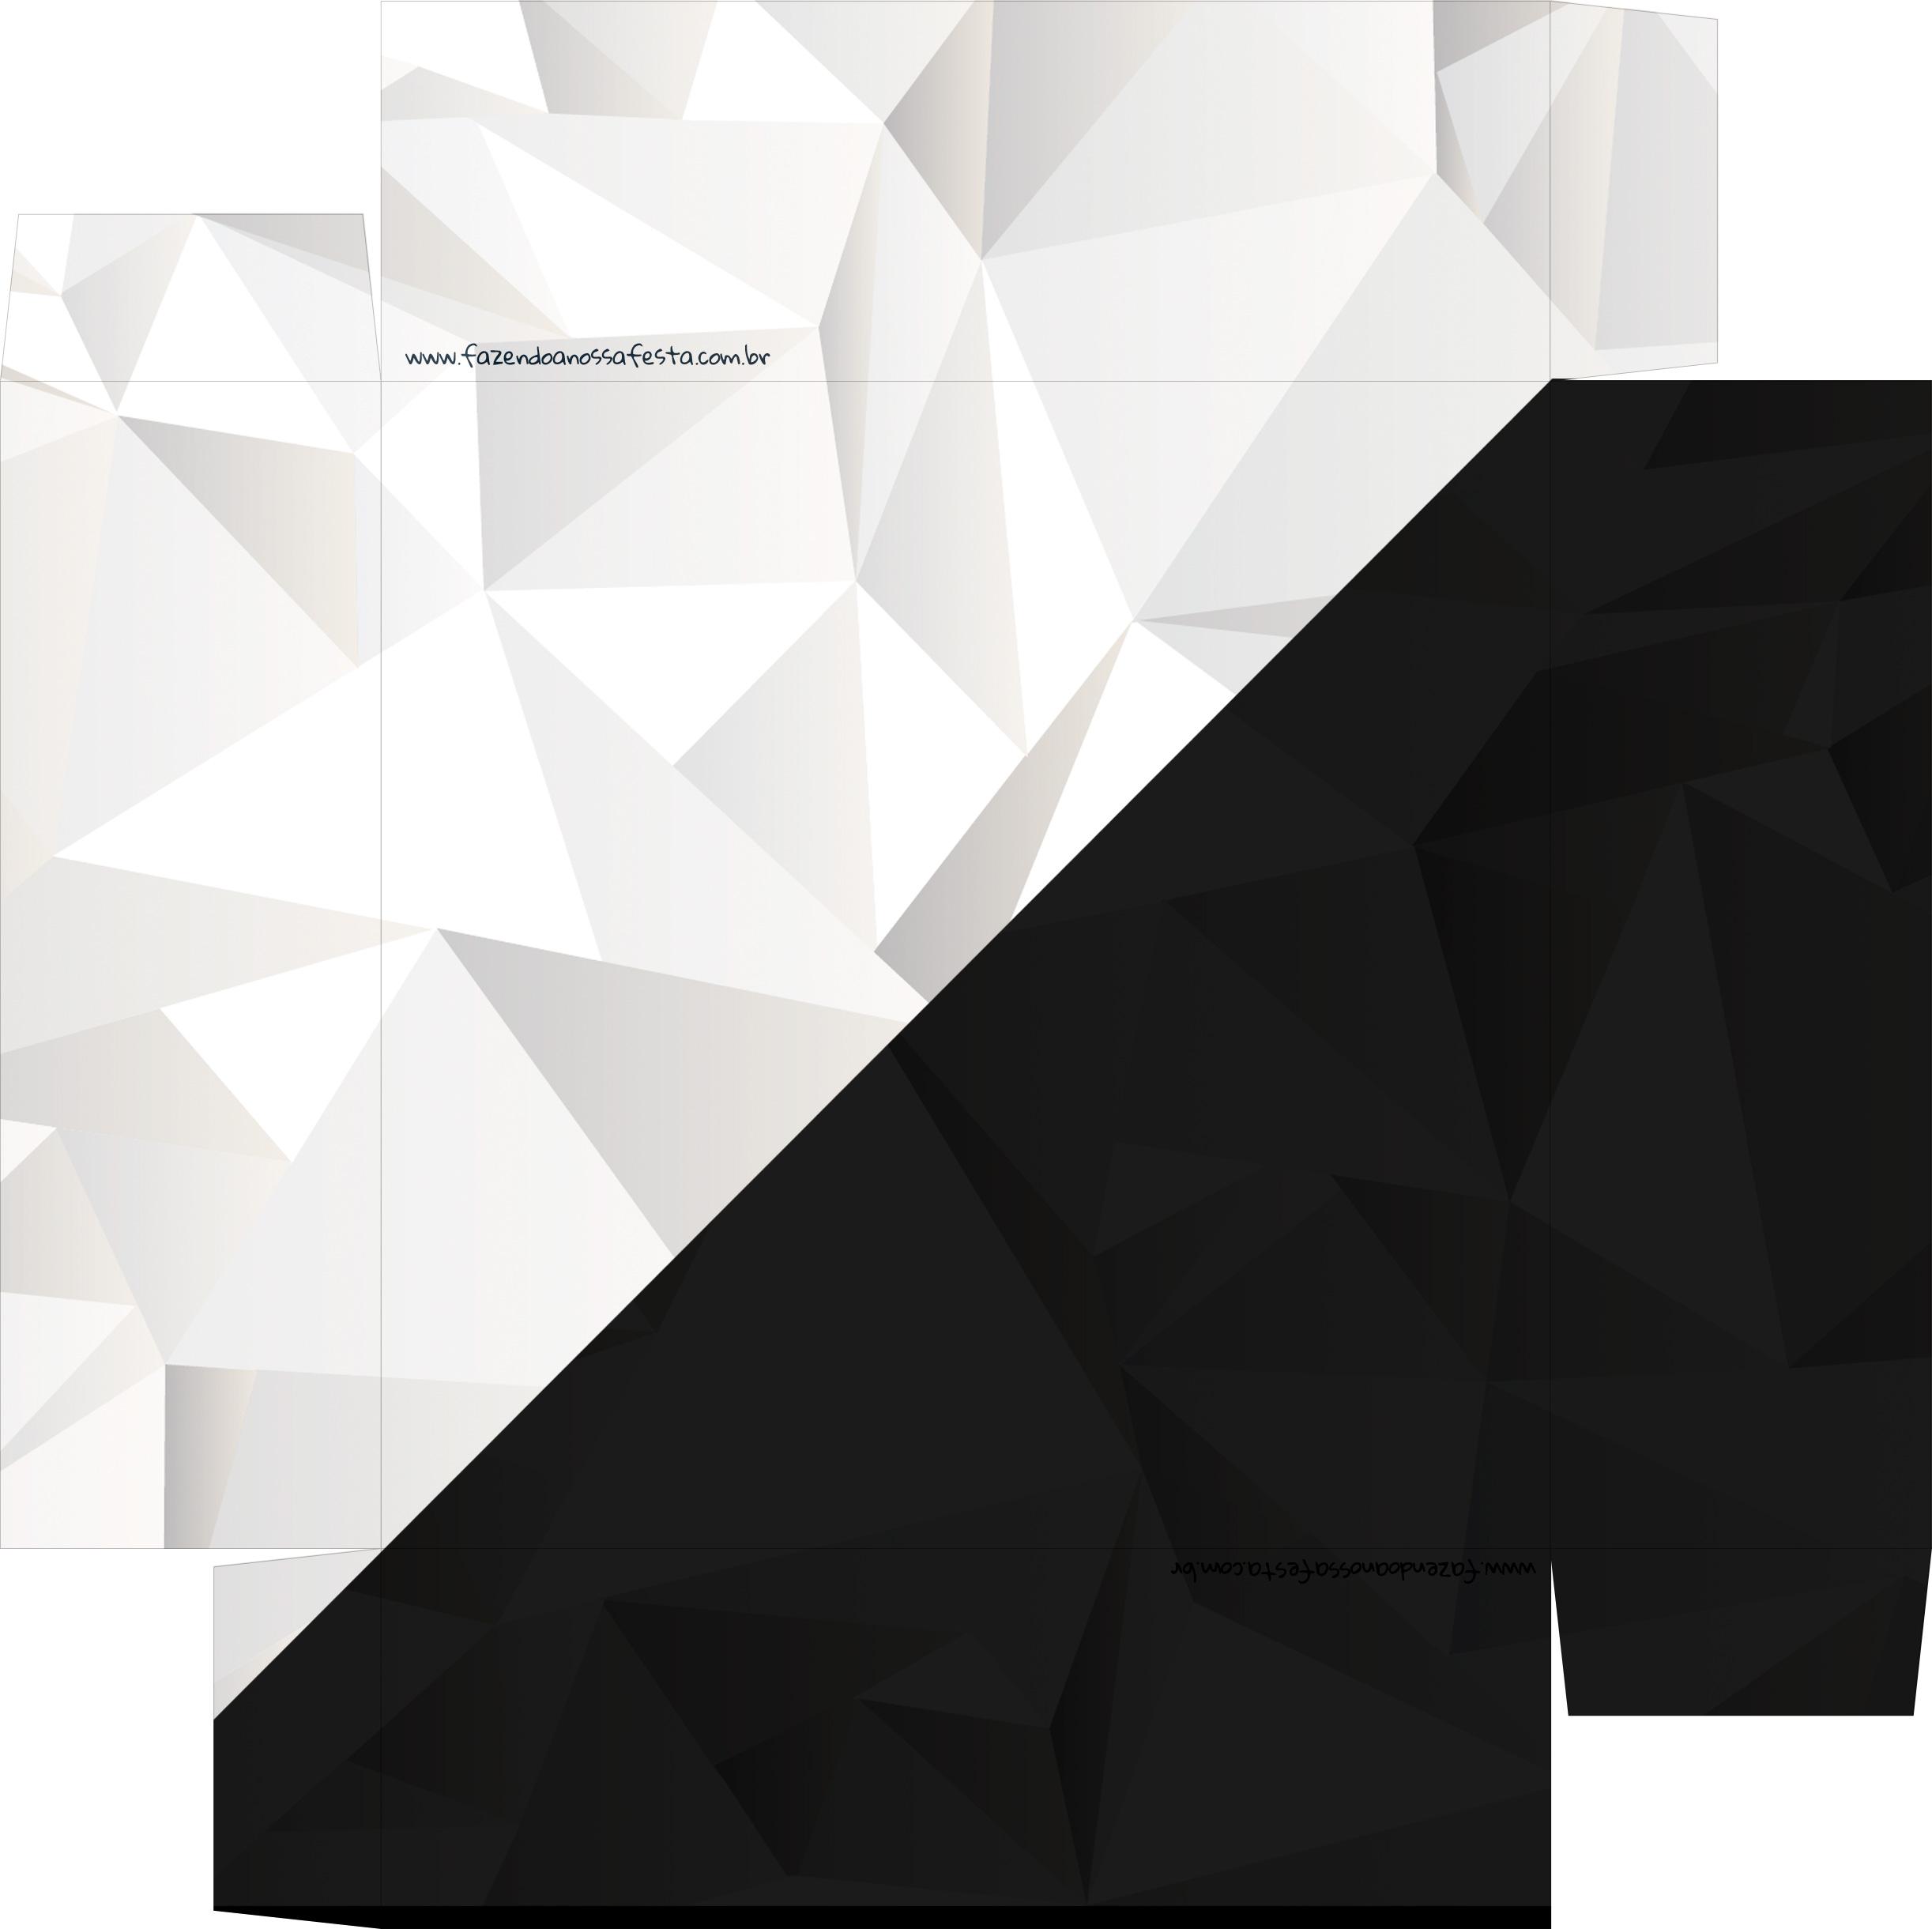 Caixa de BomBom Lembrancinha Ano Novo Diamante Negro 2 Base